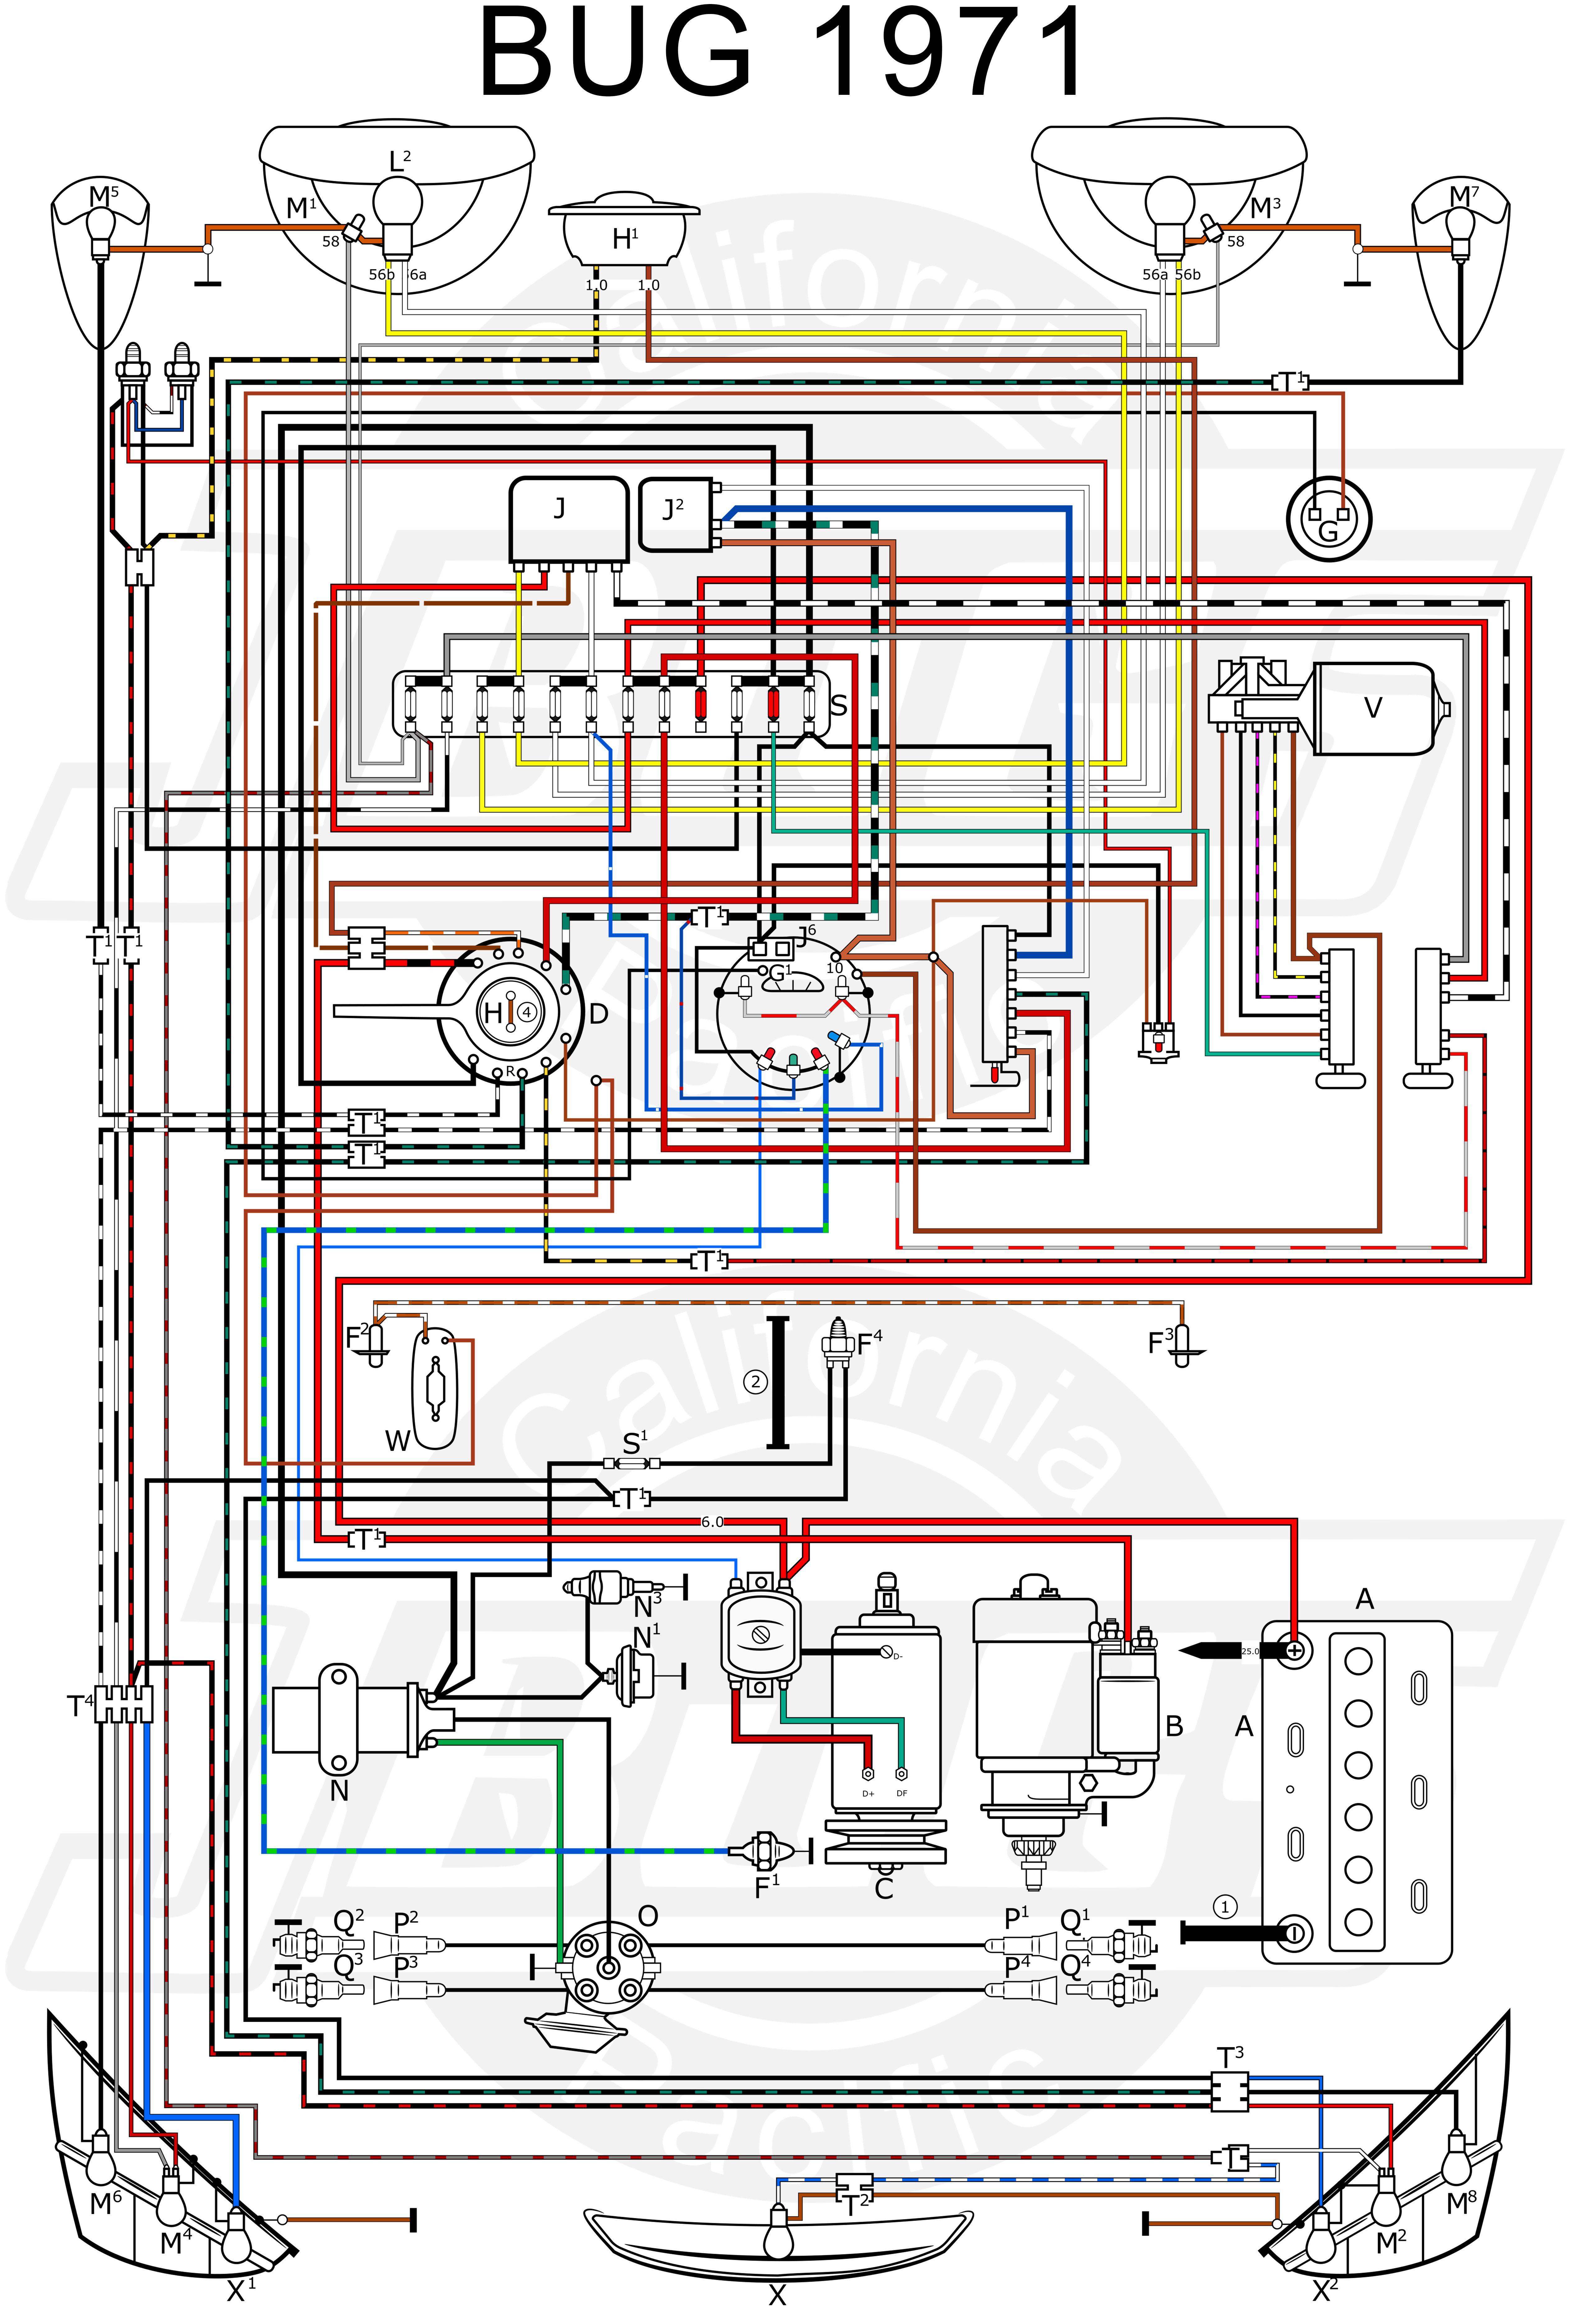 Vw Tech Article 1971 Wiring Diagram Vw Bug Vw Parts Vw Beetle Classic